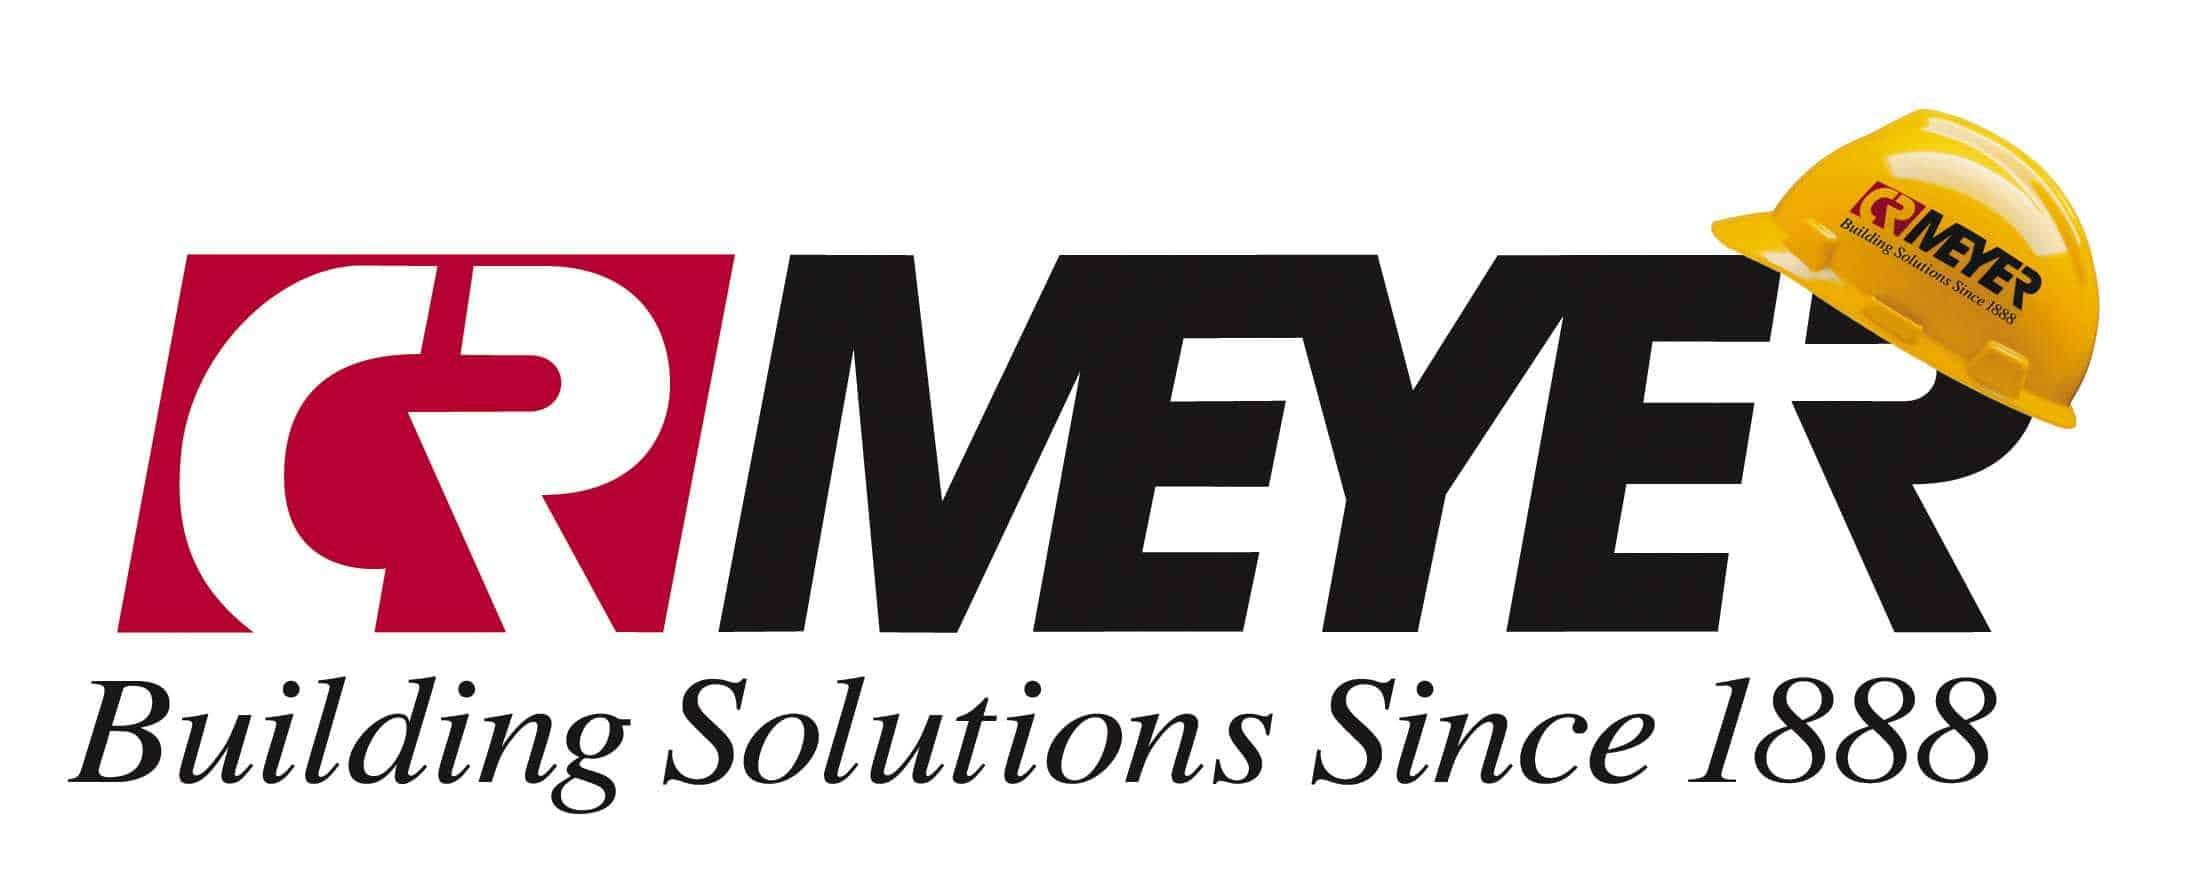 CR Meyer old logo